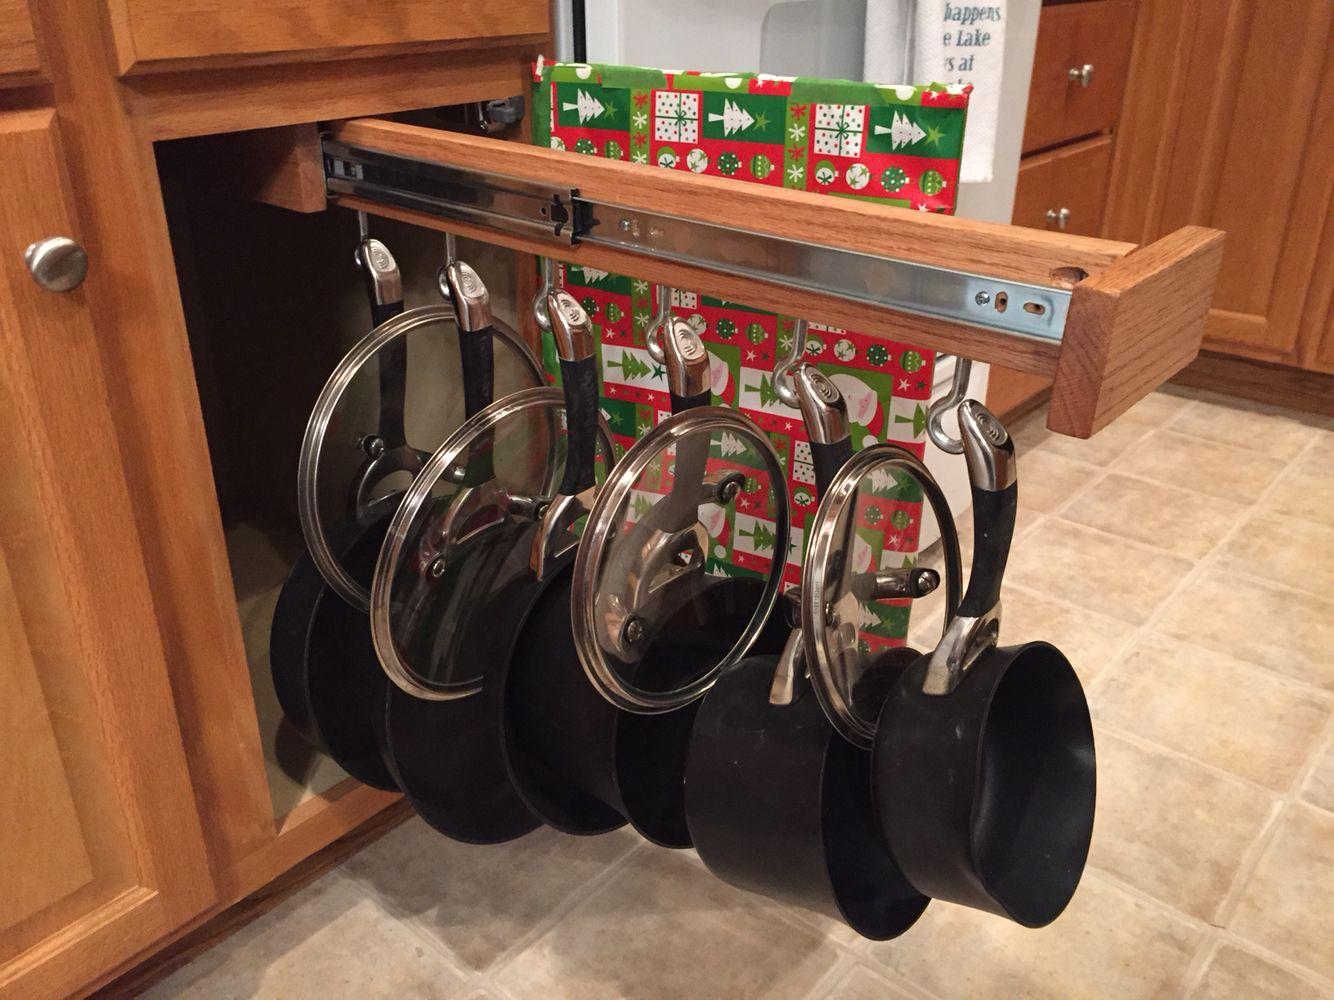 diy slide out pot and pan rack dream home pinterest pan rack kitchens and organizations. Black Bedroom Furniture Sets. Home Design Ideas